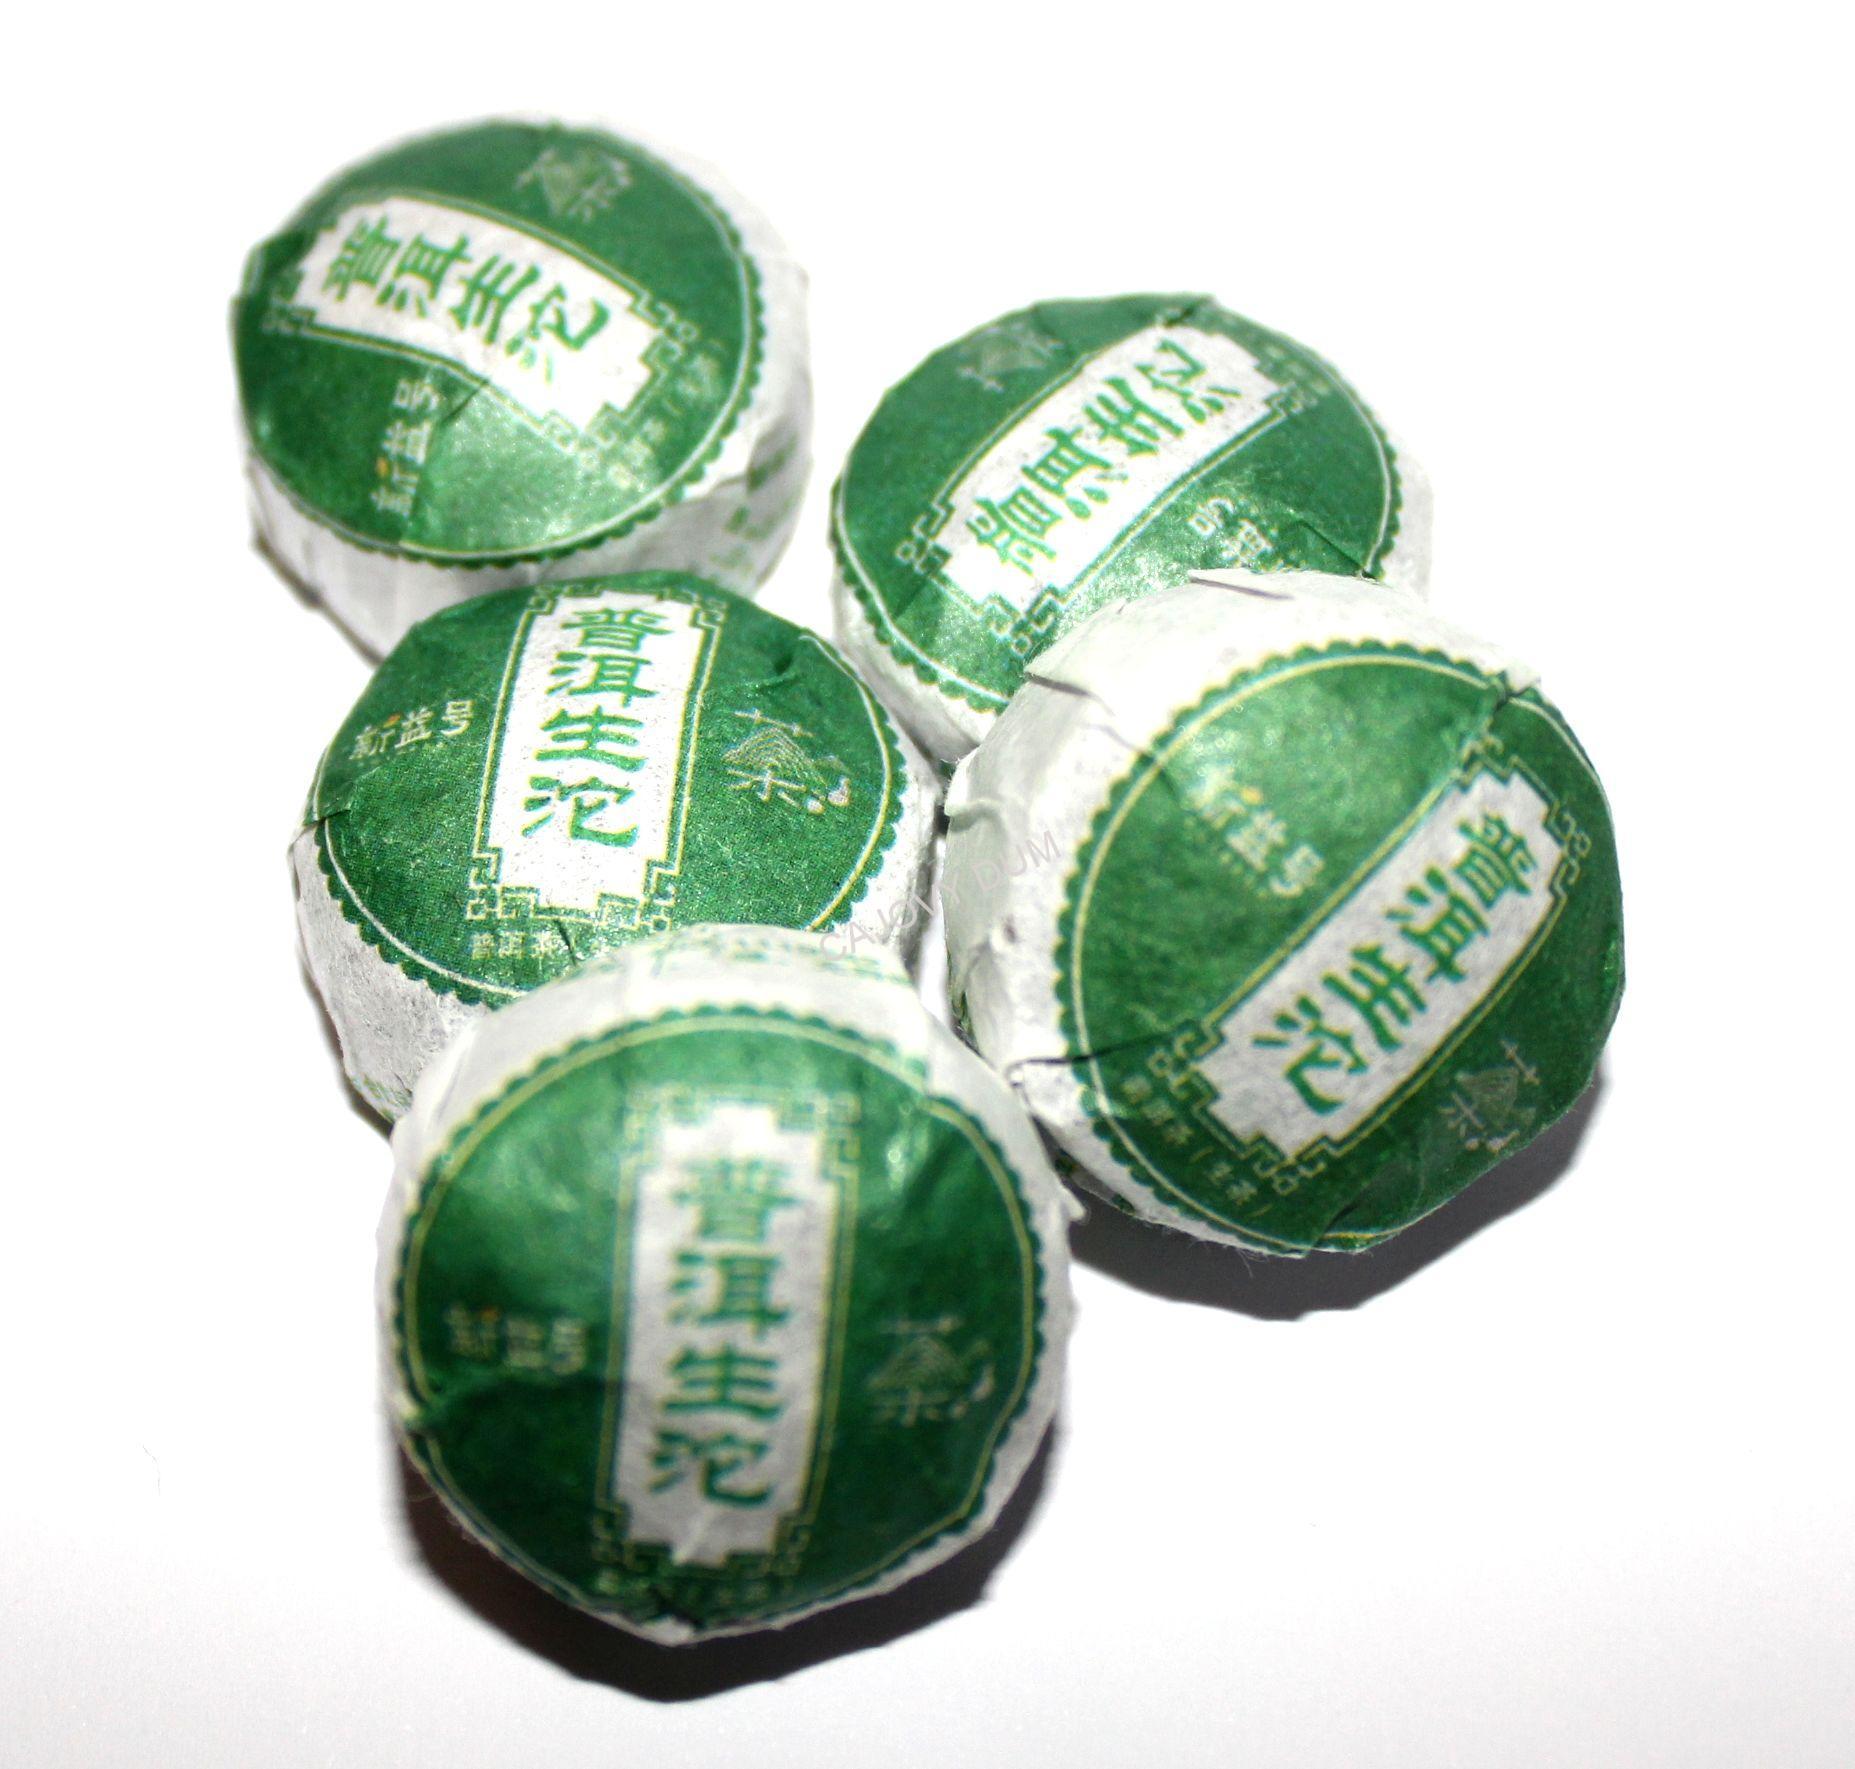 2015 Mini tuocha zelená cca 5g